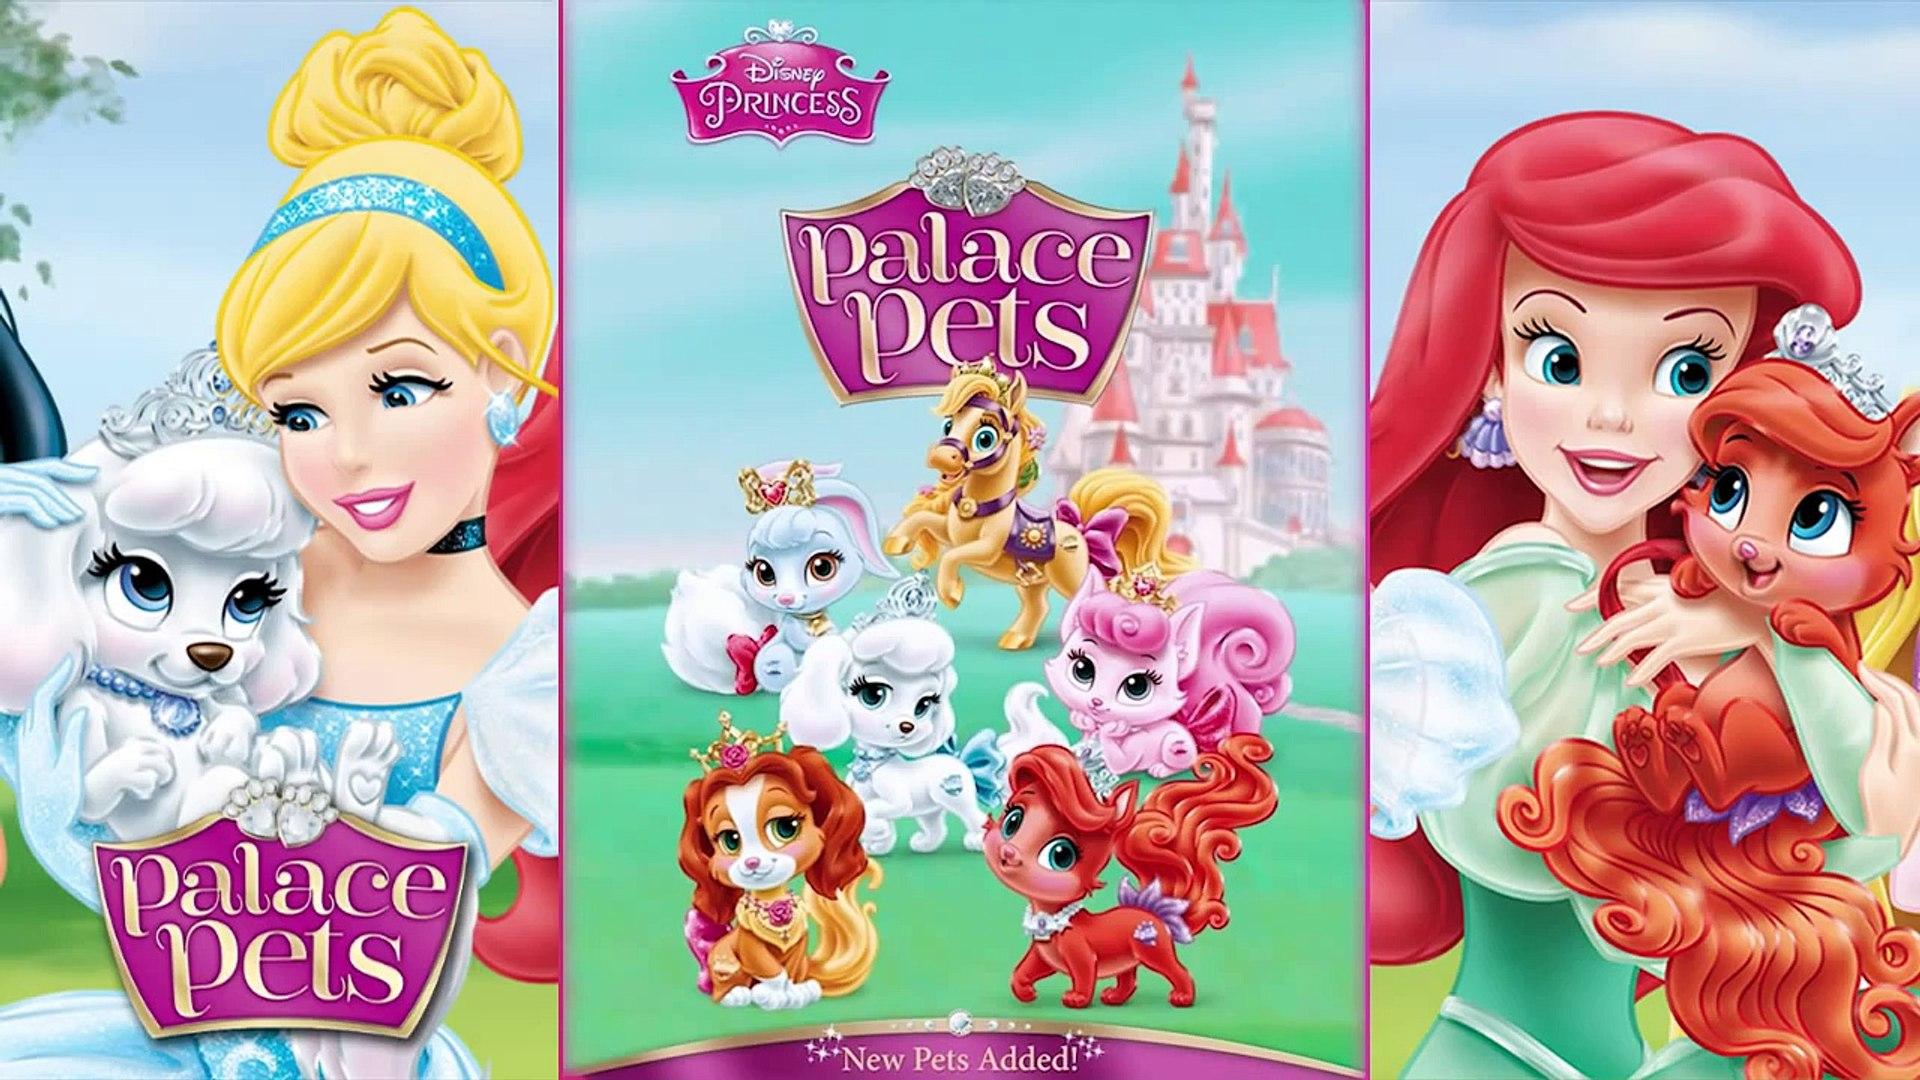 ♥ Disney Princess Palace Pets - Rapunzel & Gleam NEW PET (Princess Palace Pets Game for Children